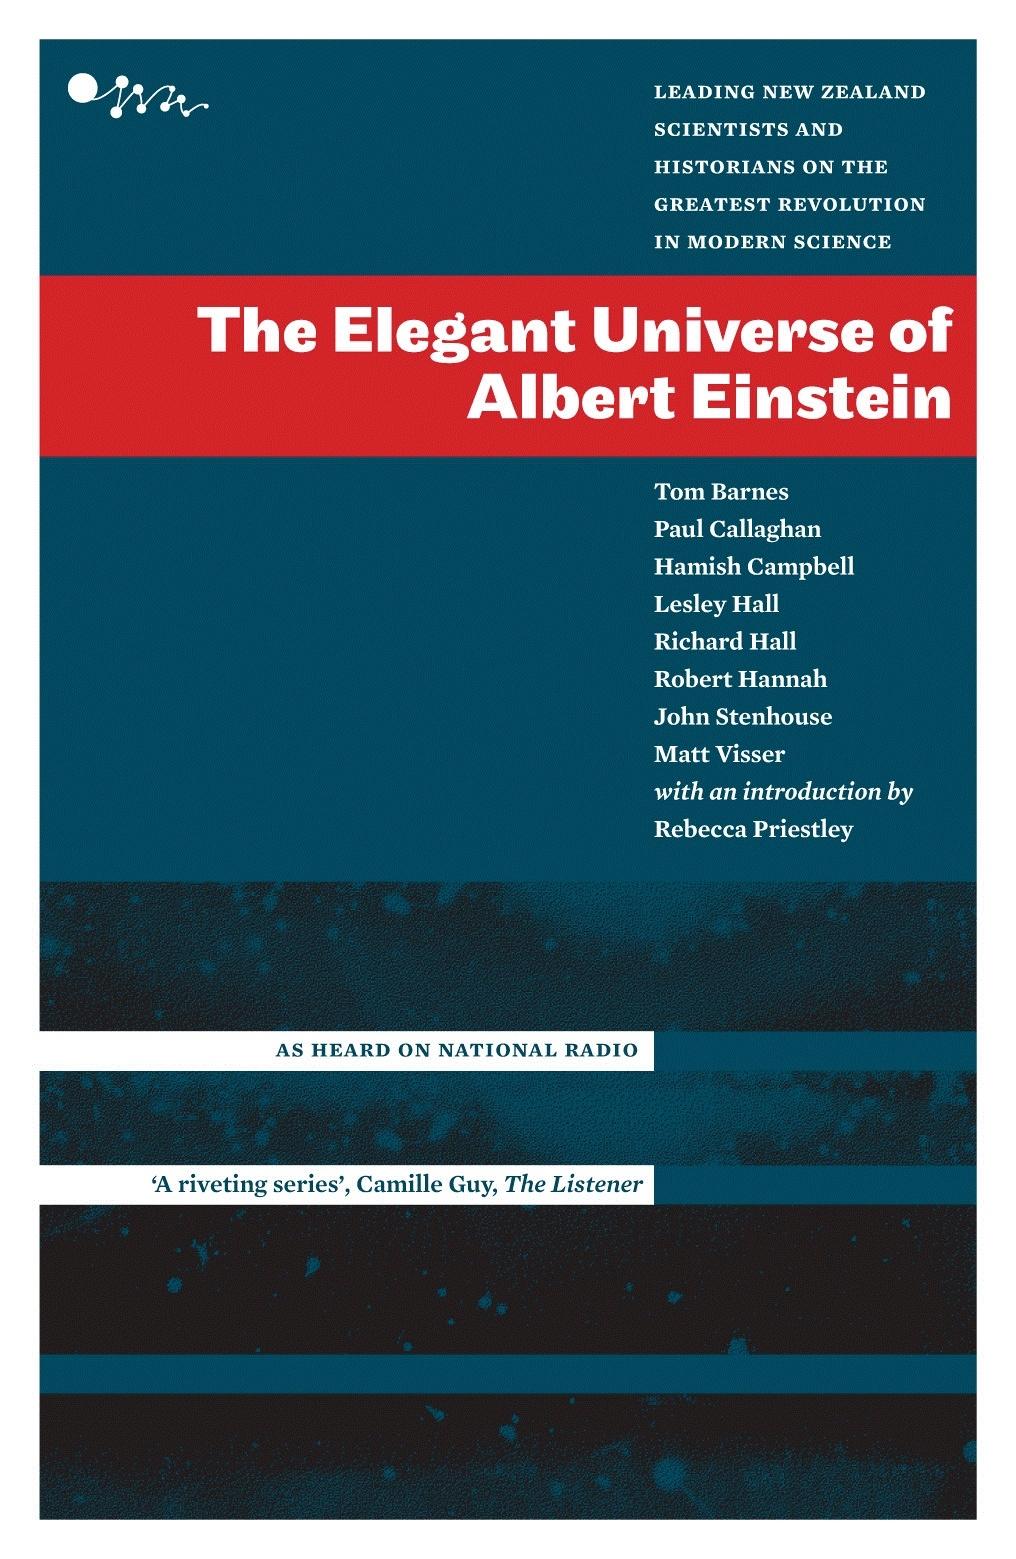 Elegant Universe Of Albert Einstein: Leading New Zealand Scientists AndHistorians On The Greatest Revolution, The